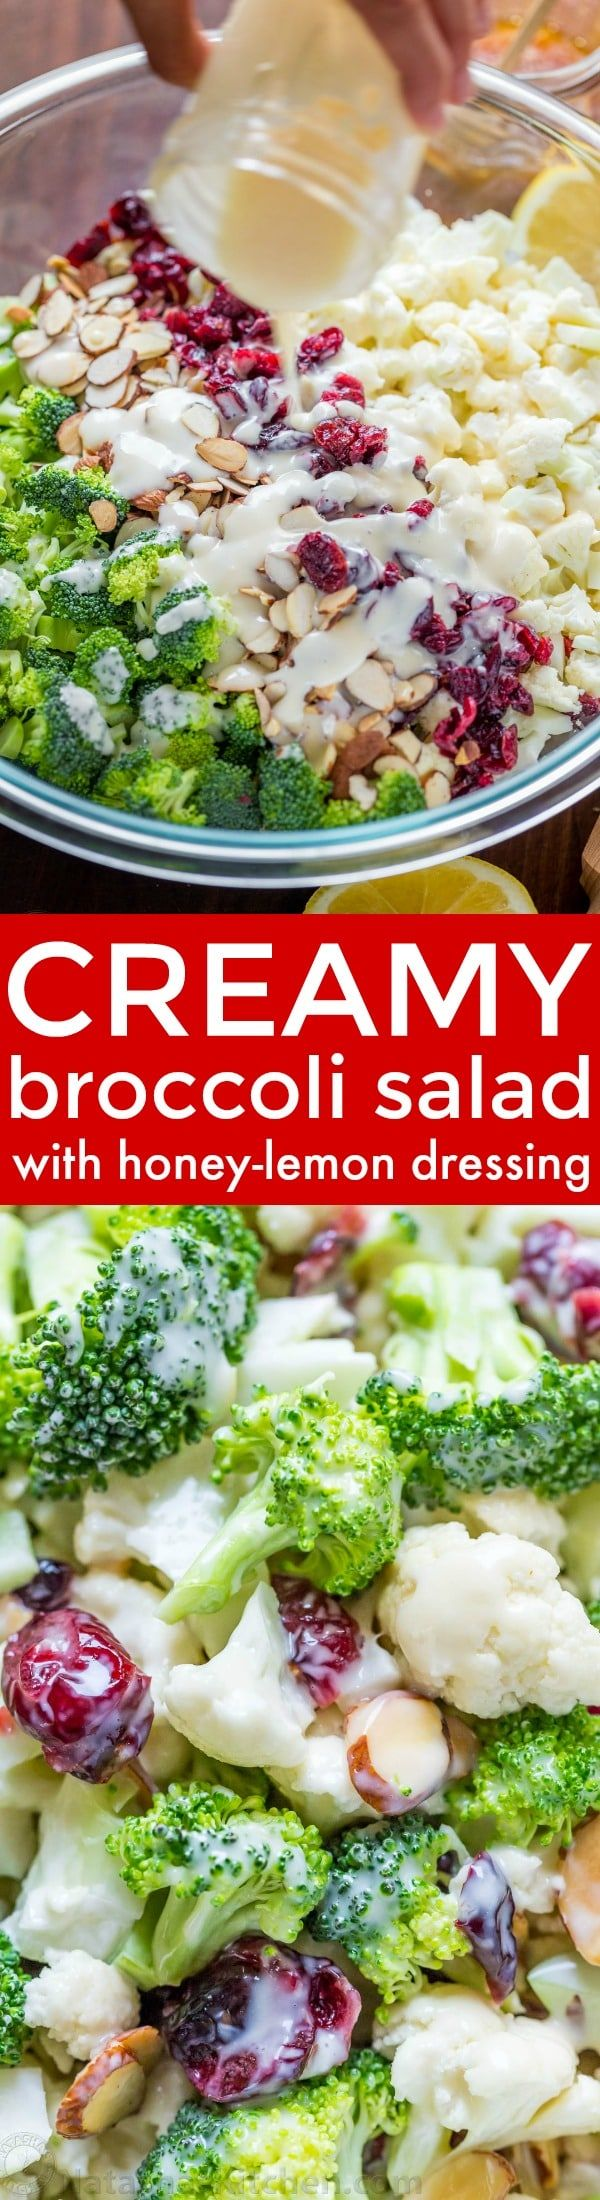 Creamy broccoli salad always gets rave reviews. Every bite of this creamy broccoli salad is coated in a honey-lemon dressing. Crisp, crunchy, chewy, tasty!   natashaskitchen.com